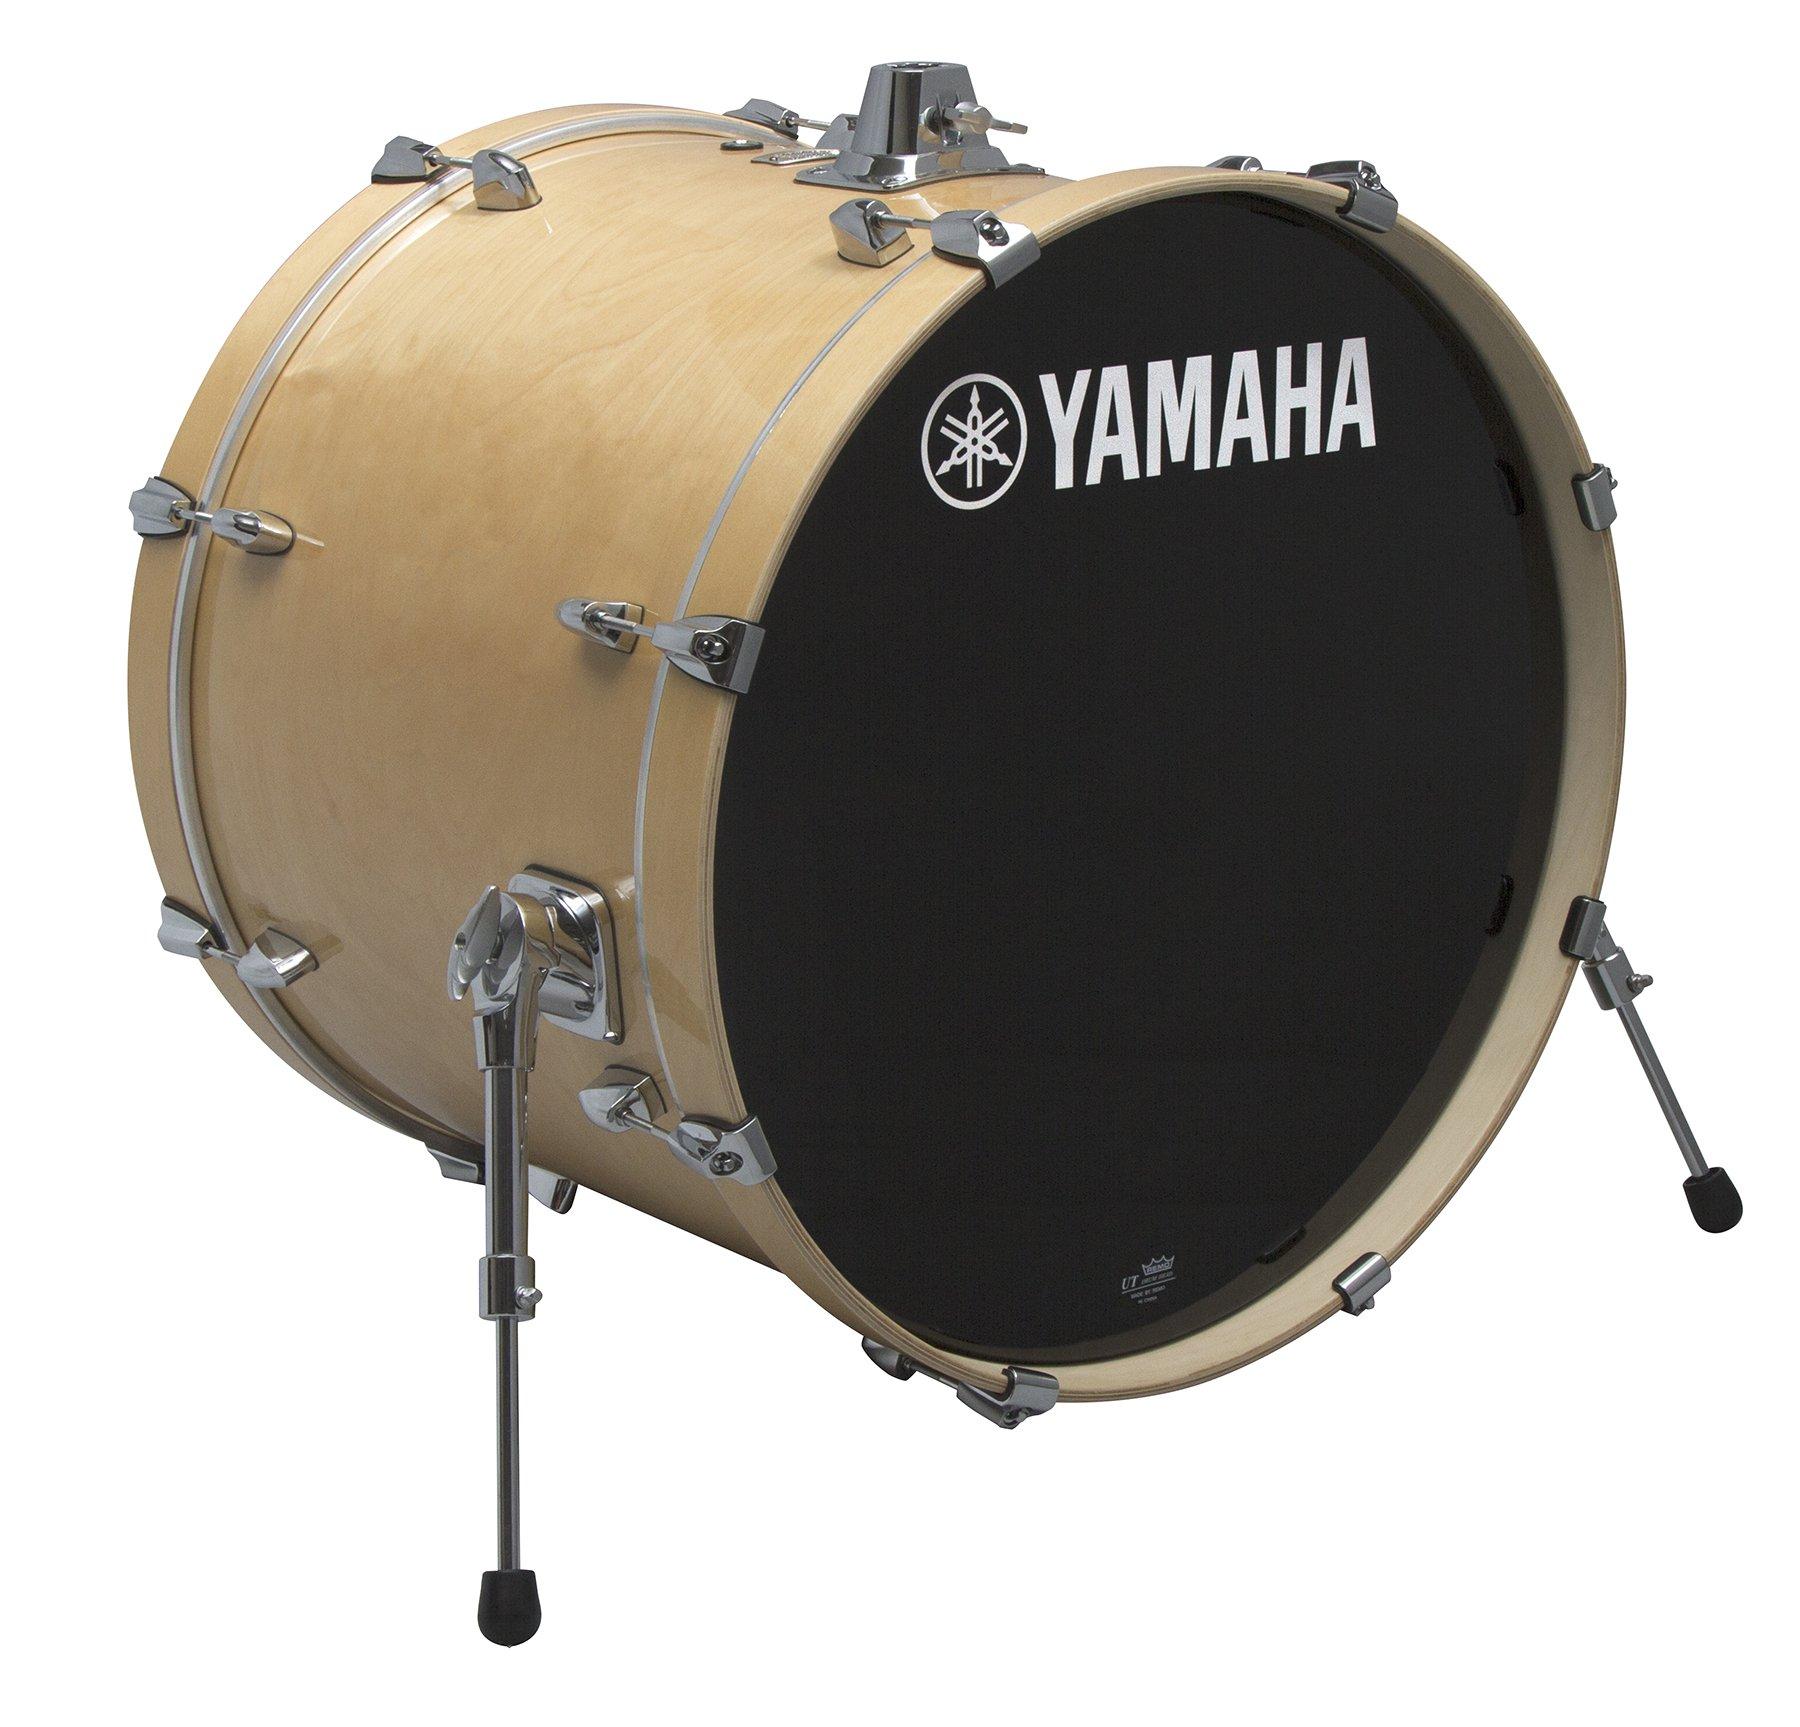 Yamaha Stage Custom Birch 22x17 Bass Drum, Natural Wood